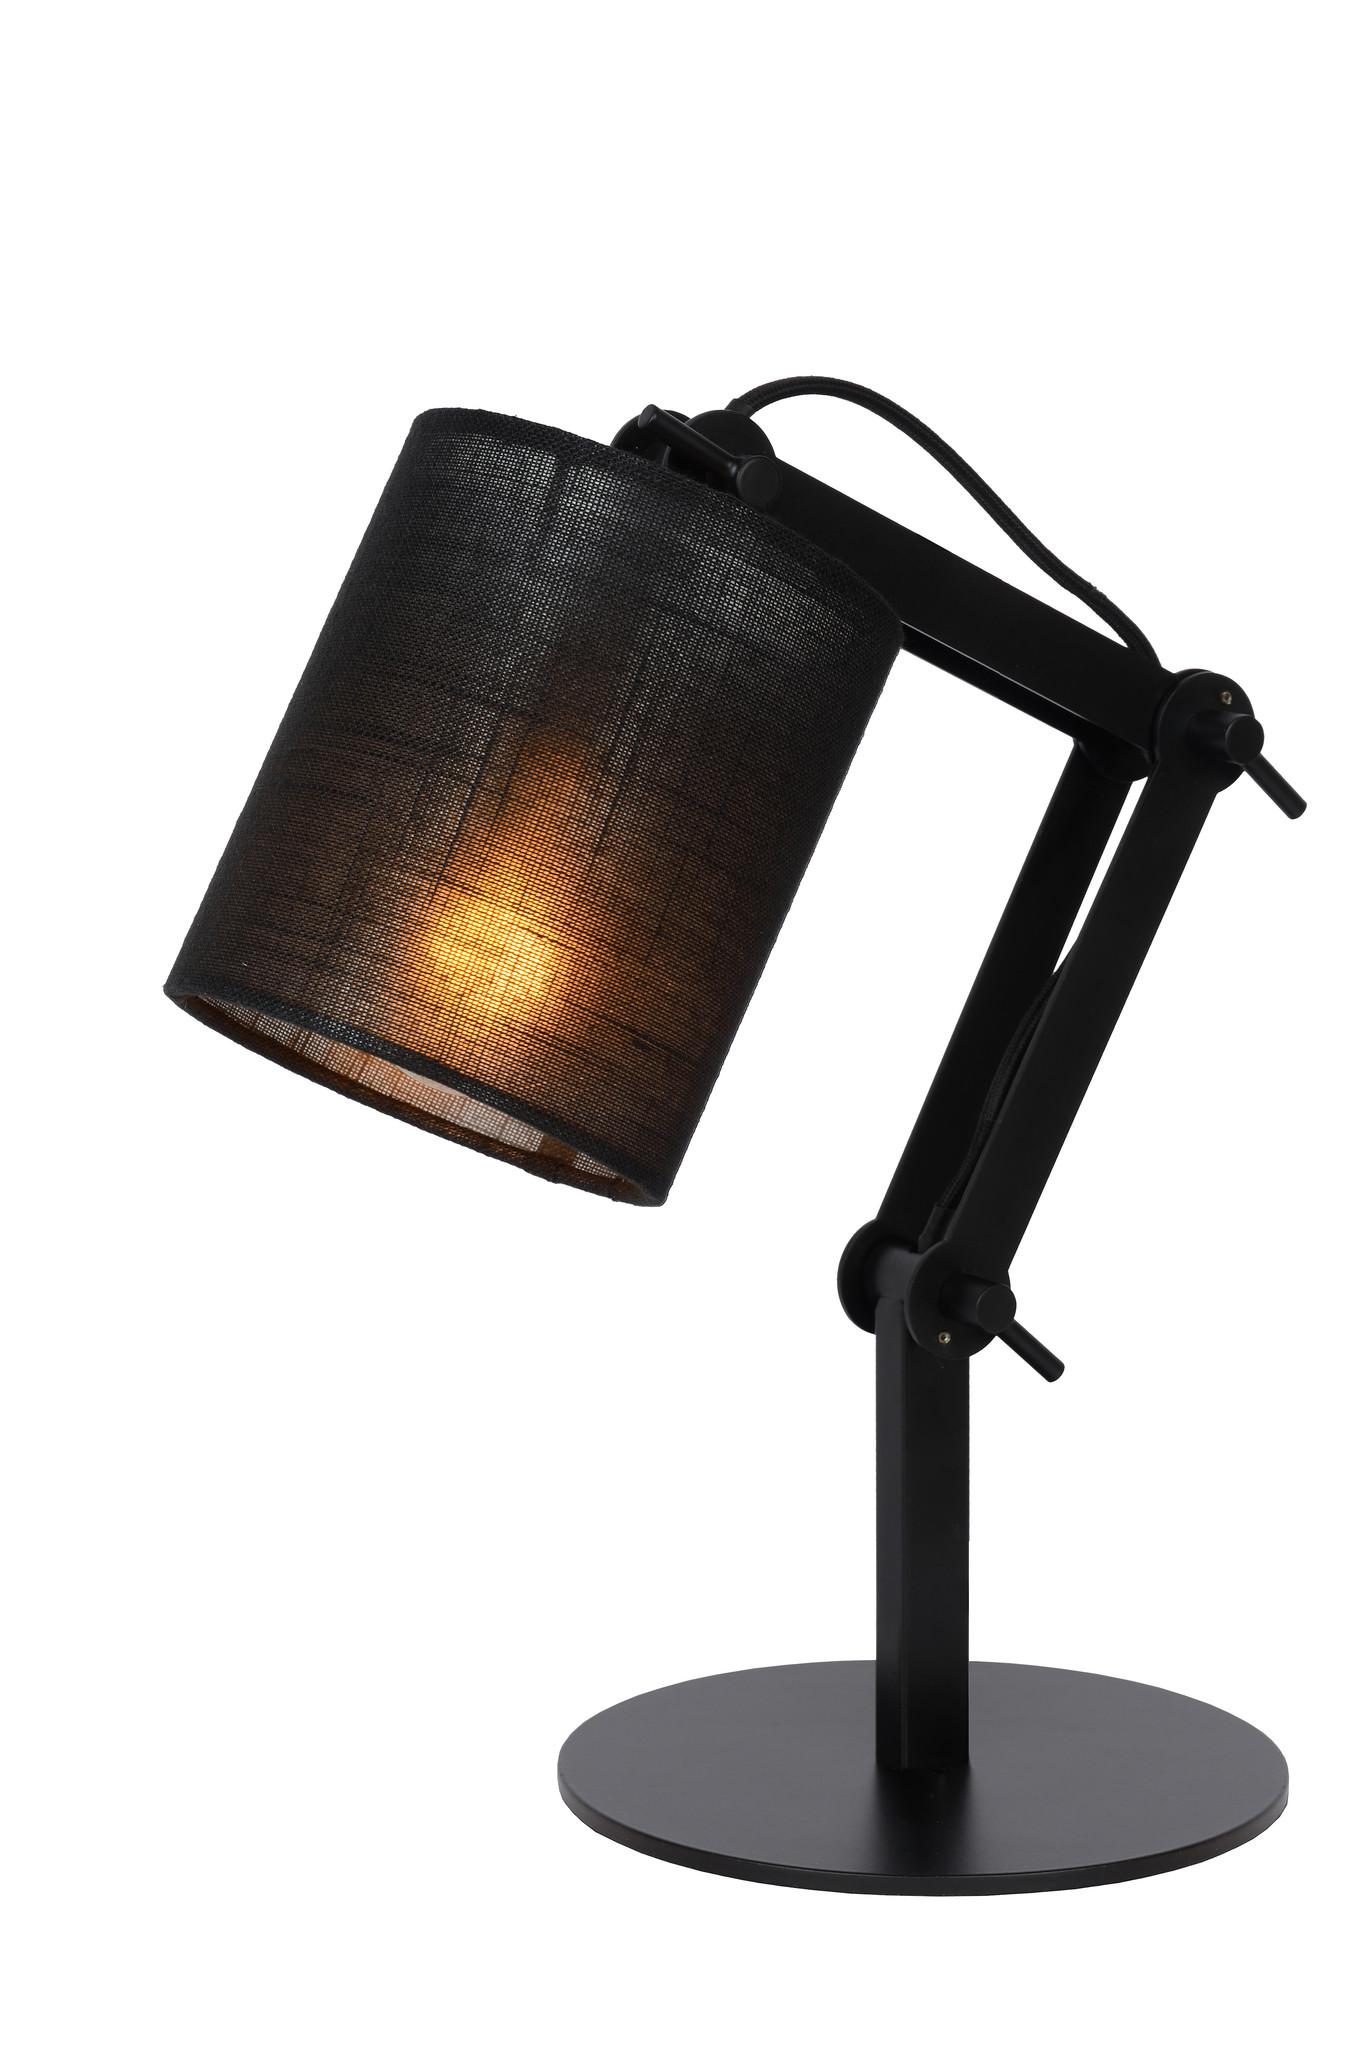 Lucide TAMPA Tafellamp-Zwart-1xE27-40W-Metaal